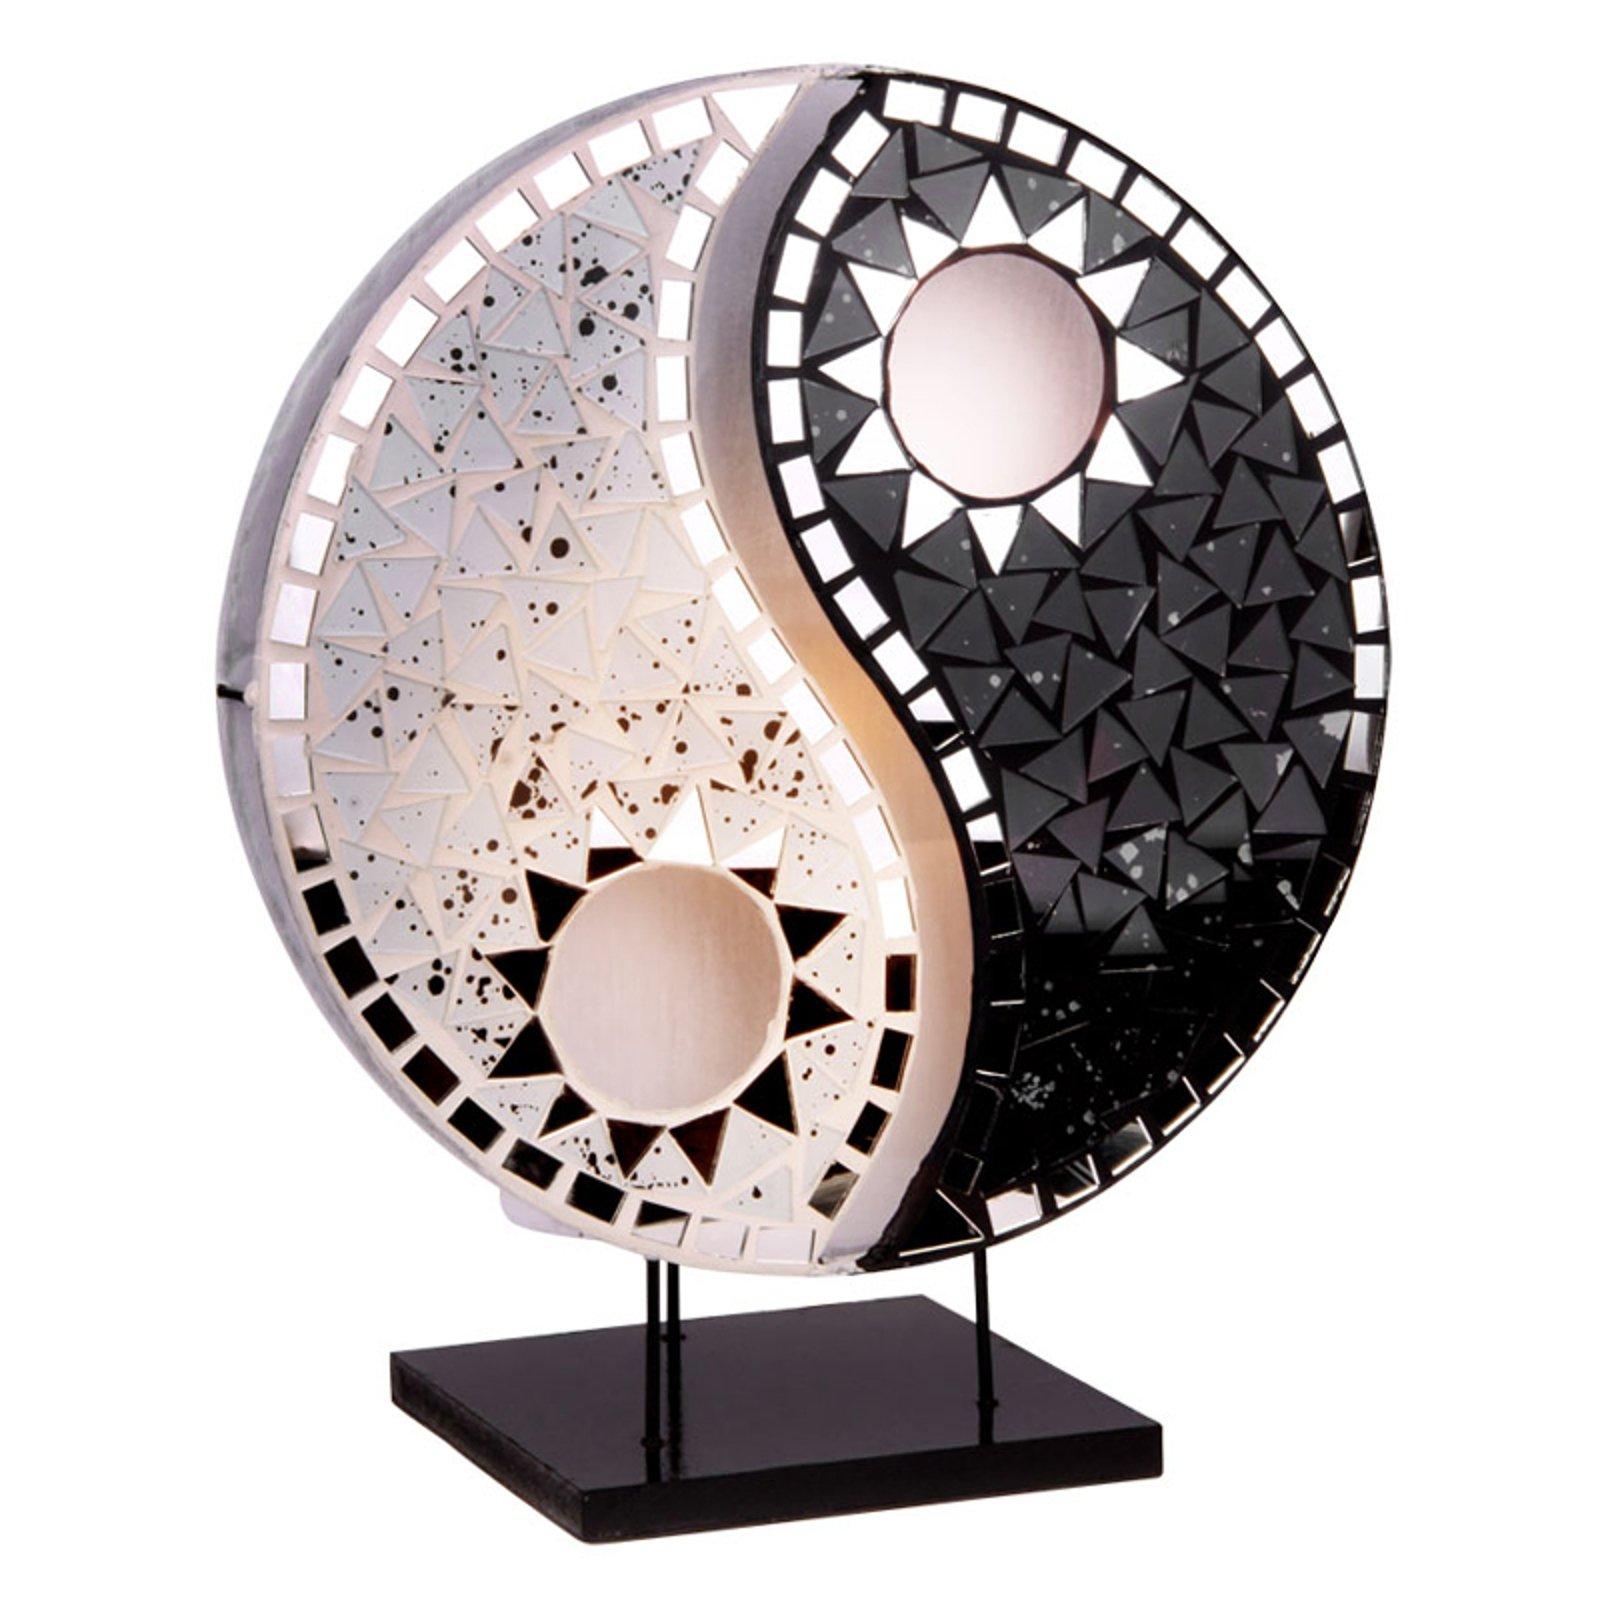 Bordlampe Ying Yang m. mosaiske speilsteiner svart